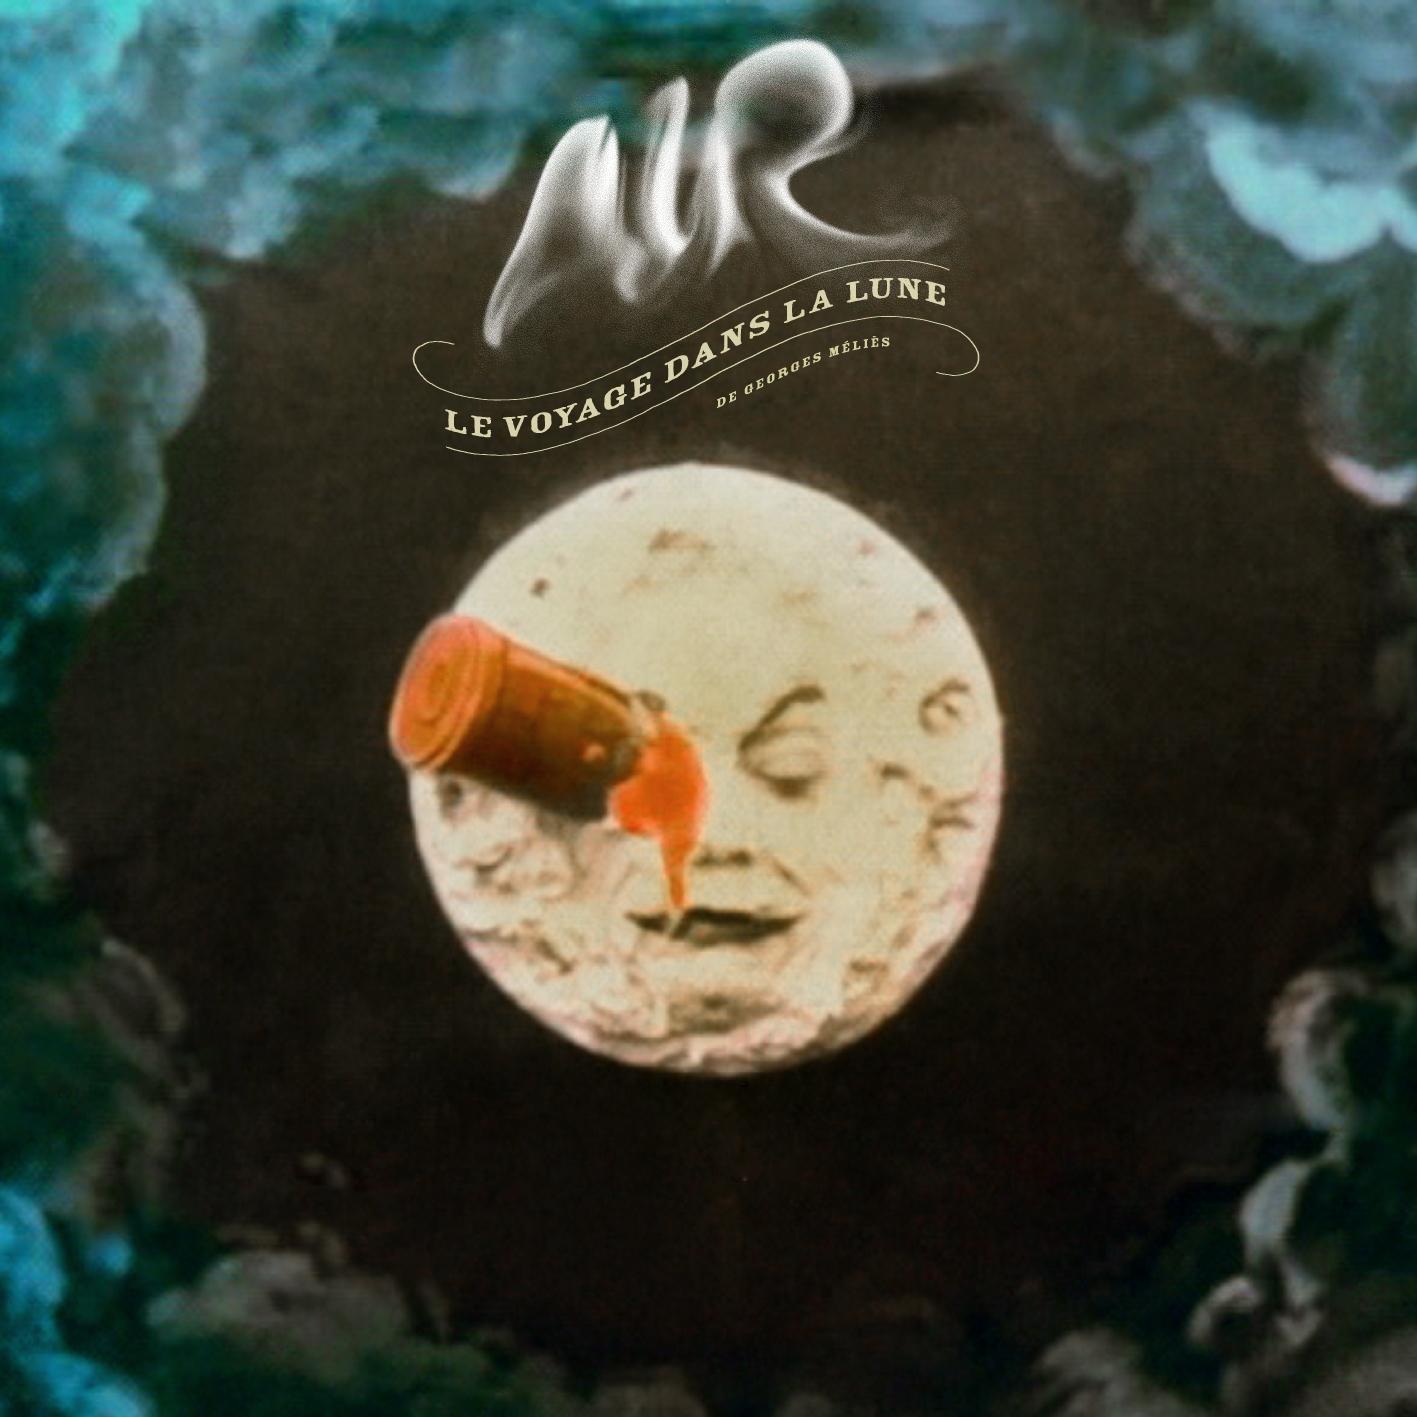 A rodar XLIV Airalbum